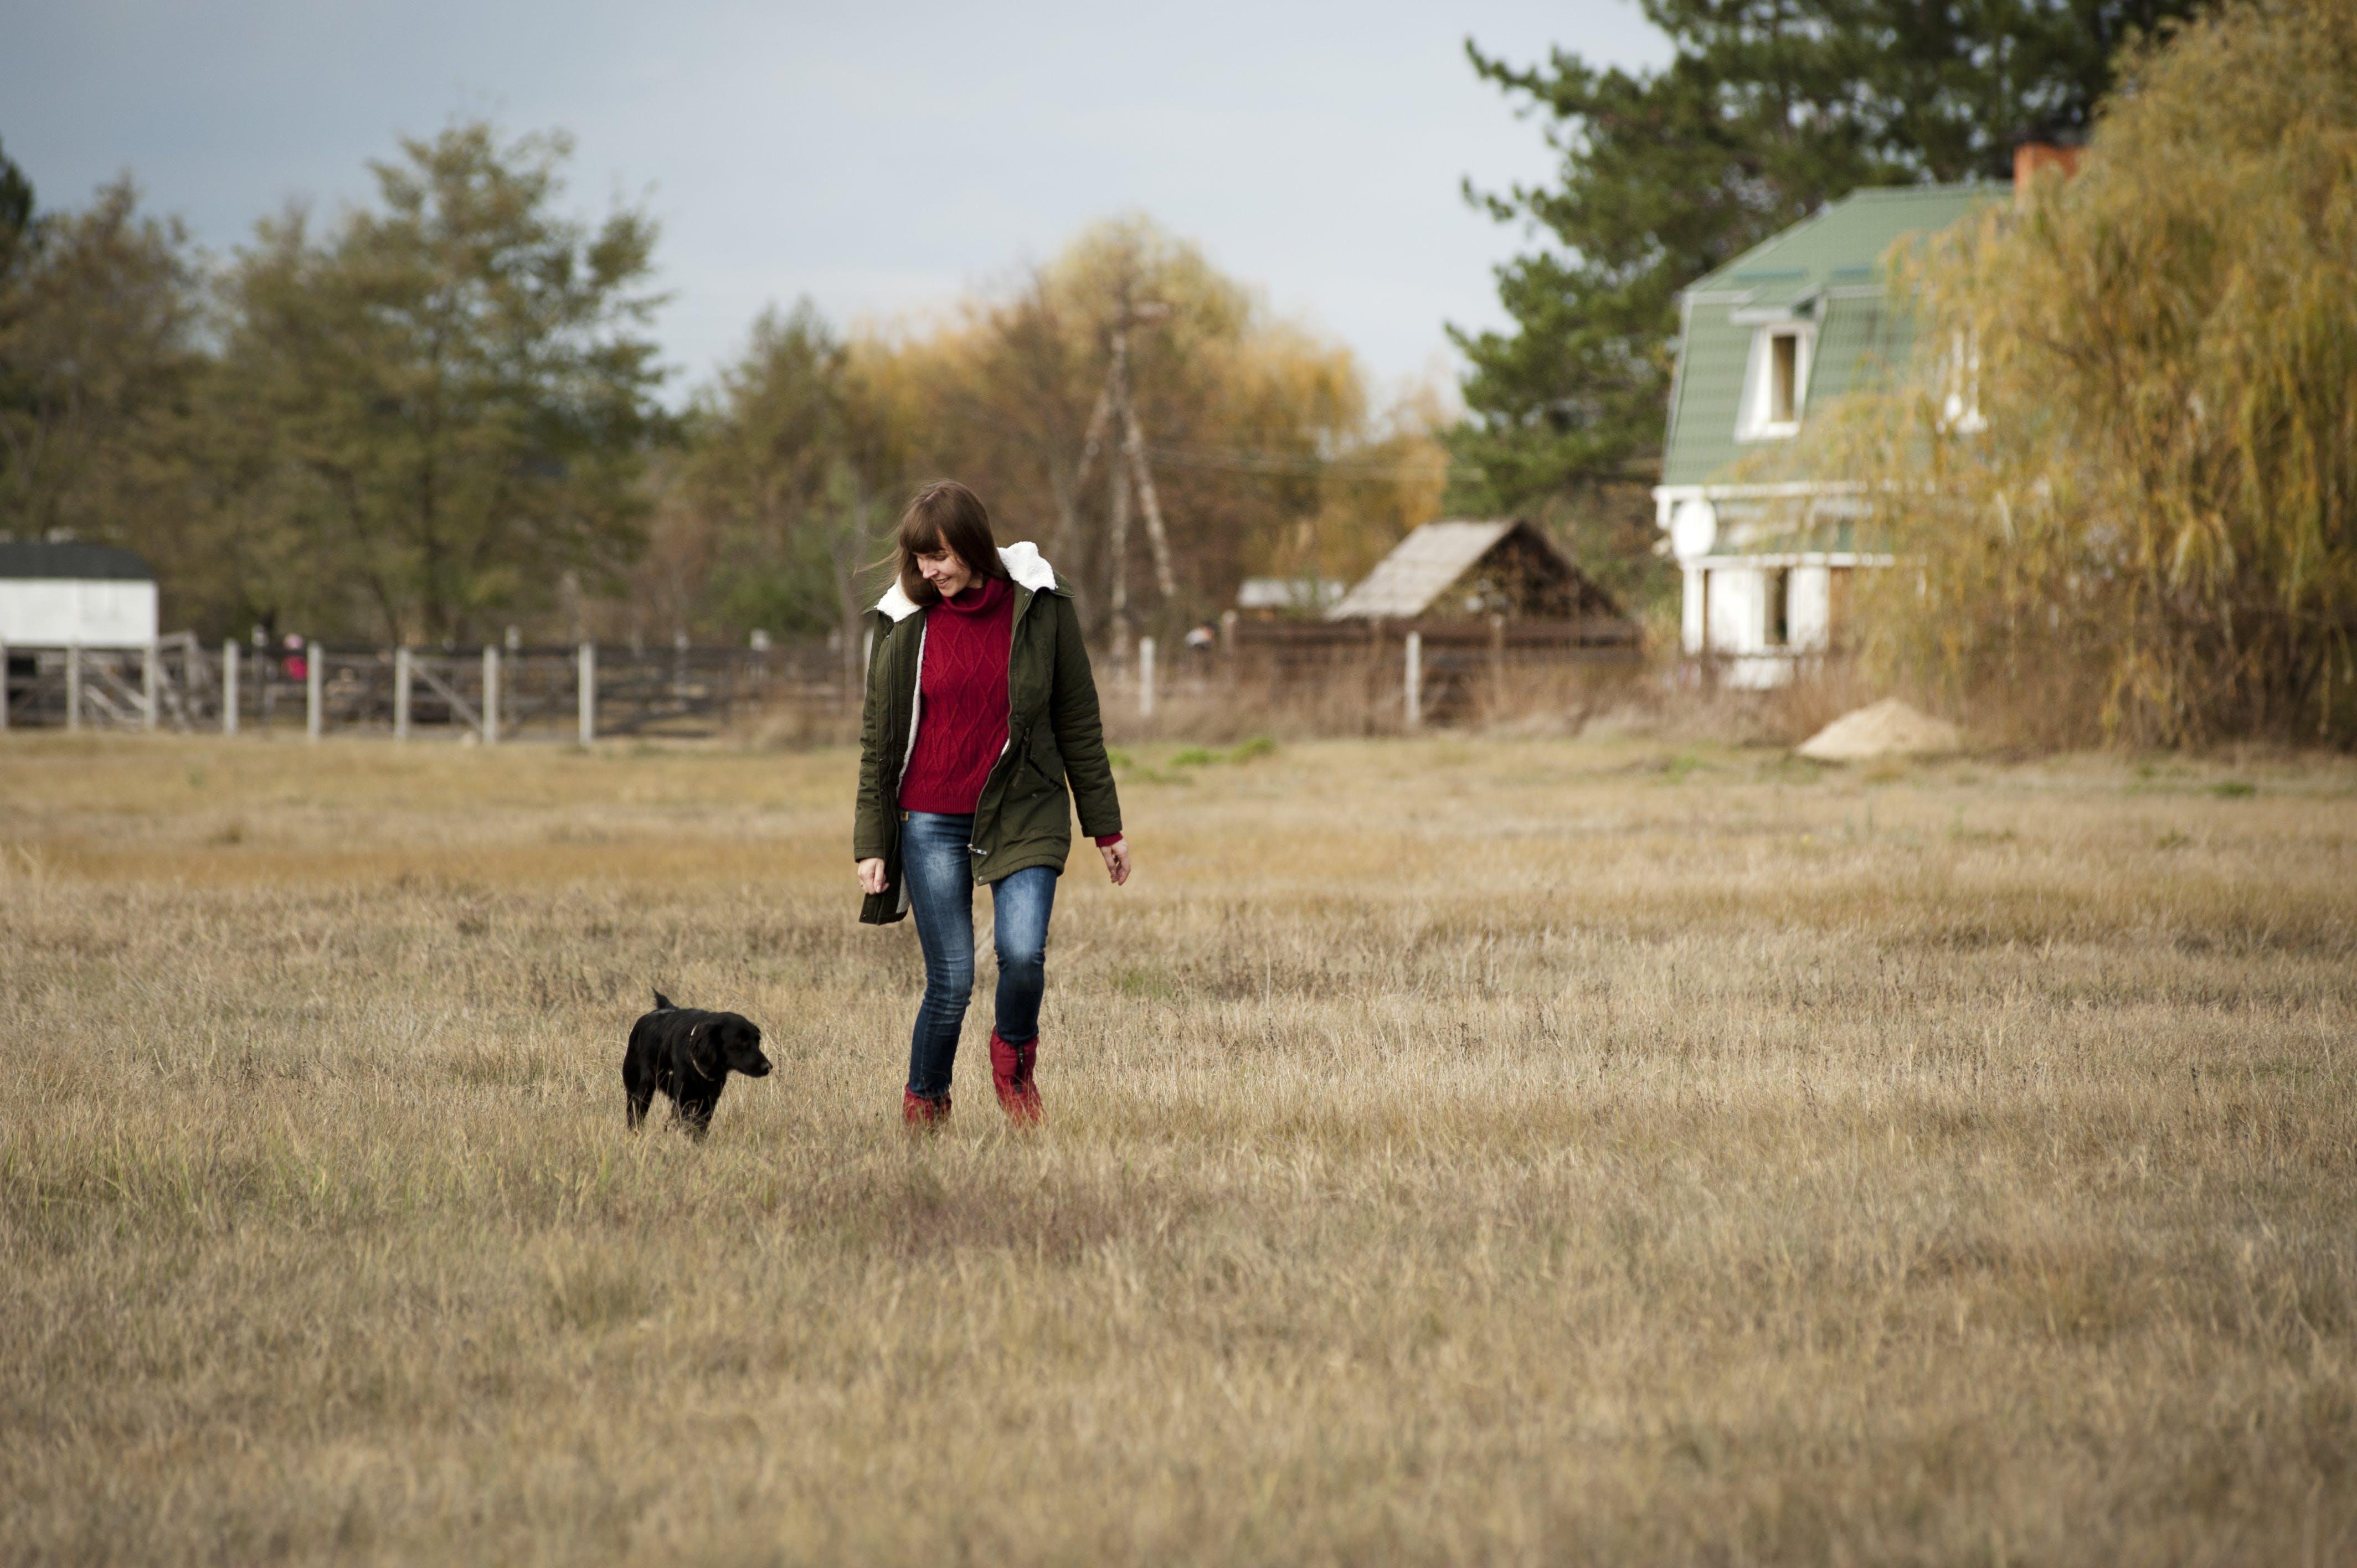 Woman Wearing Brown Zip-up Jacket and Blue Denim Jeans Walking Beside Short-coated Black Dog at Daytime